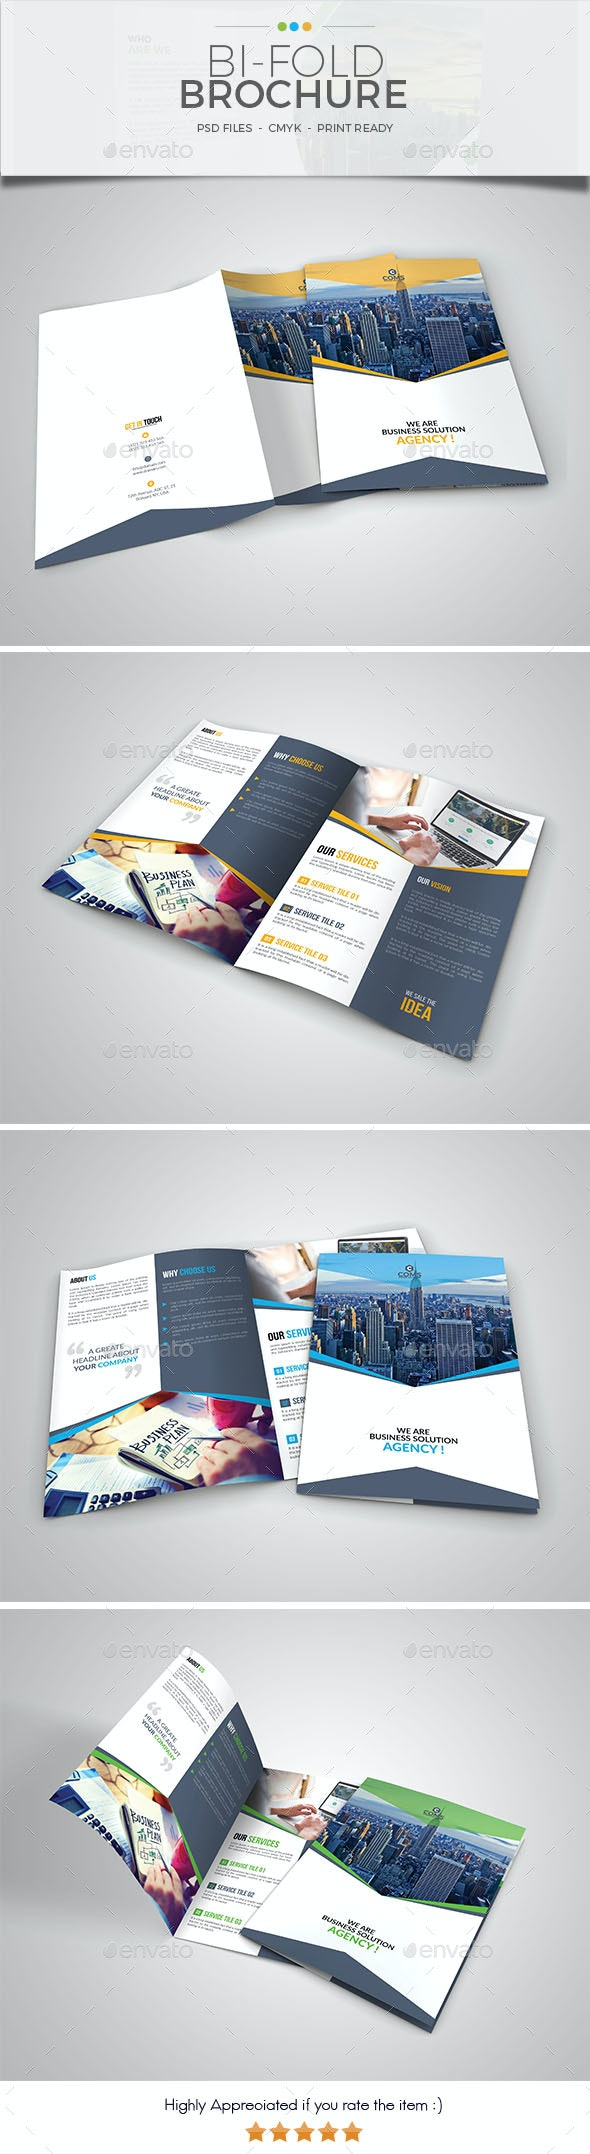 Corporate Bifold Brochure Template 03 - Corporate Brochures